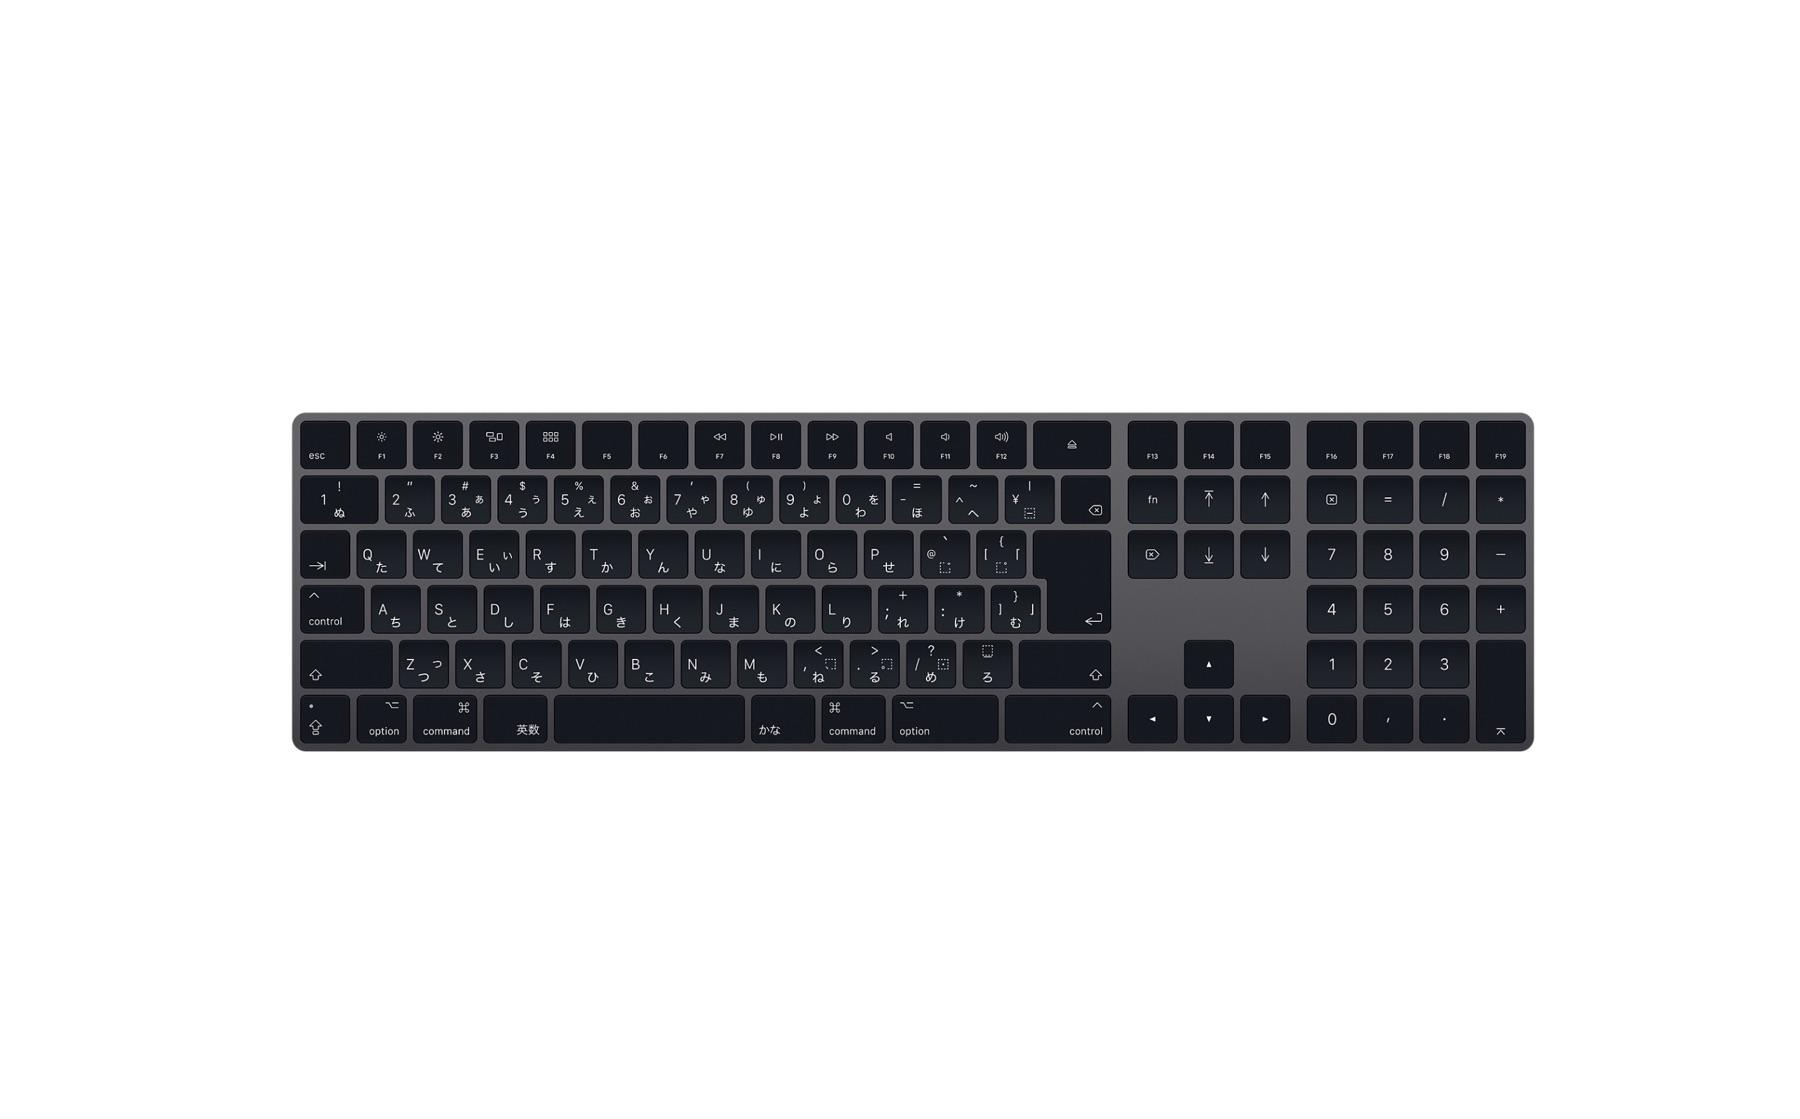 Magic Keyboard(テンキー付き)とMagic Trackpad 2の新色「スペースグレイ」でデスク周りを新調しようか悩む理由